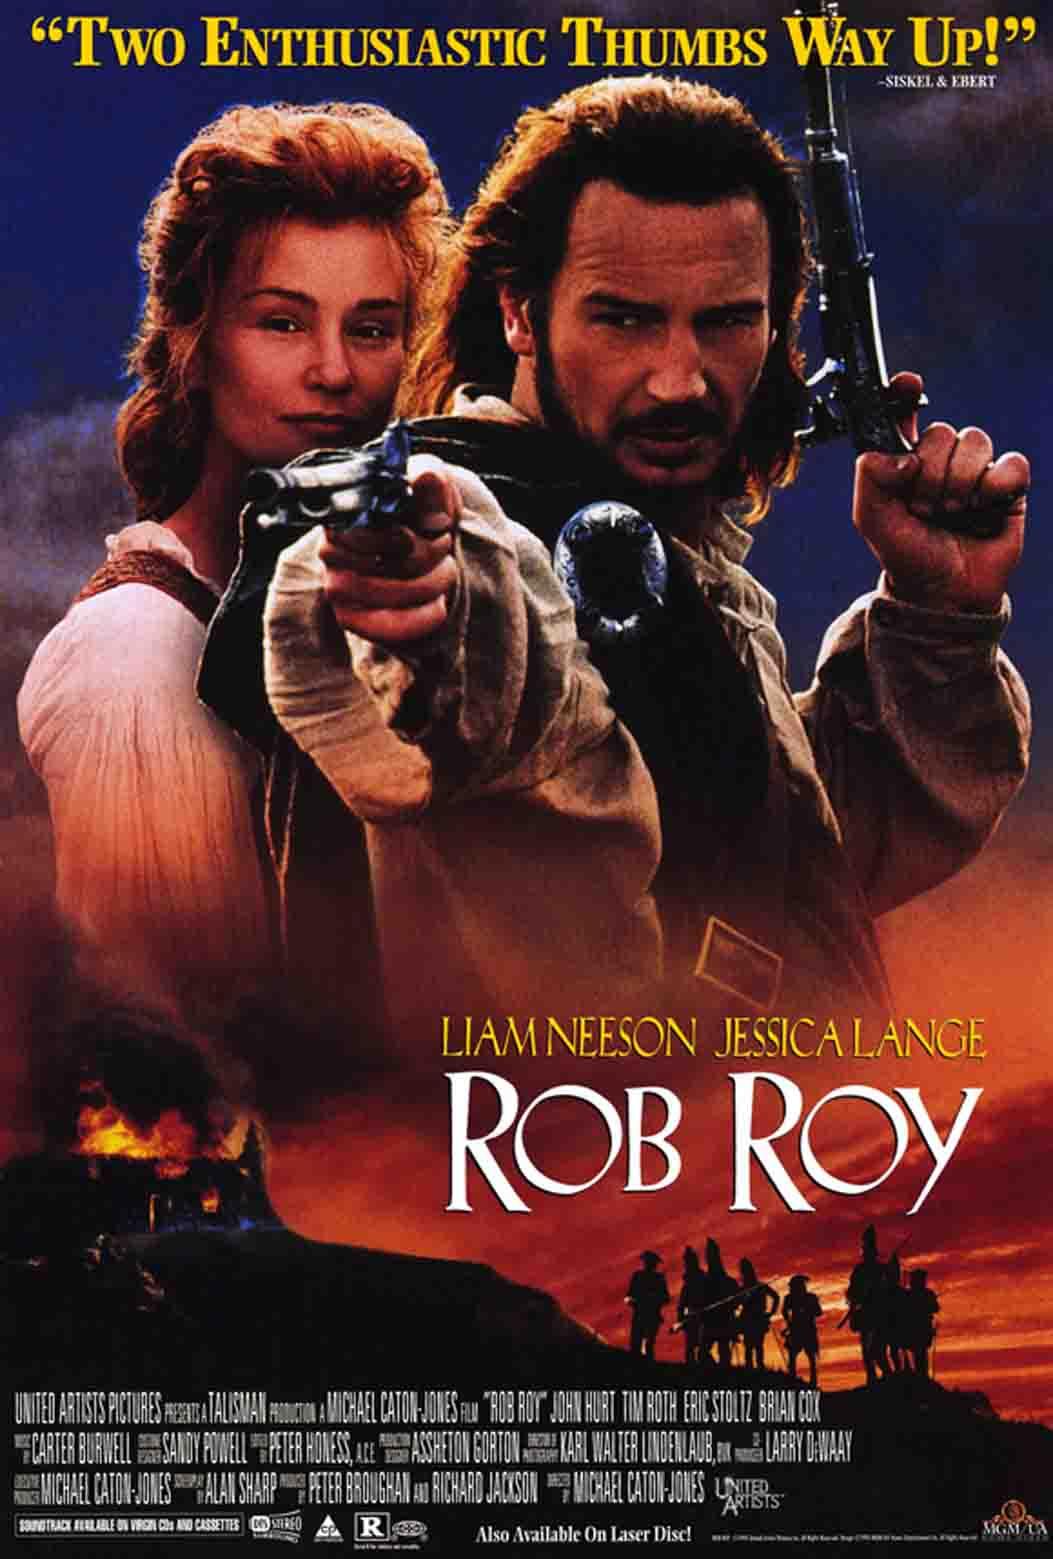 Rob roy film locations